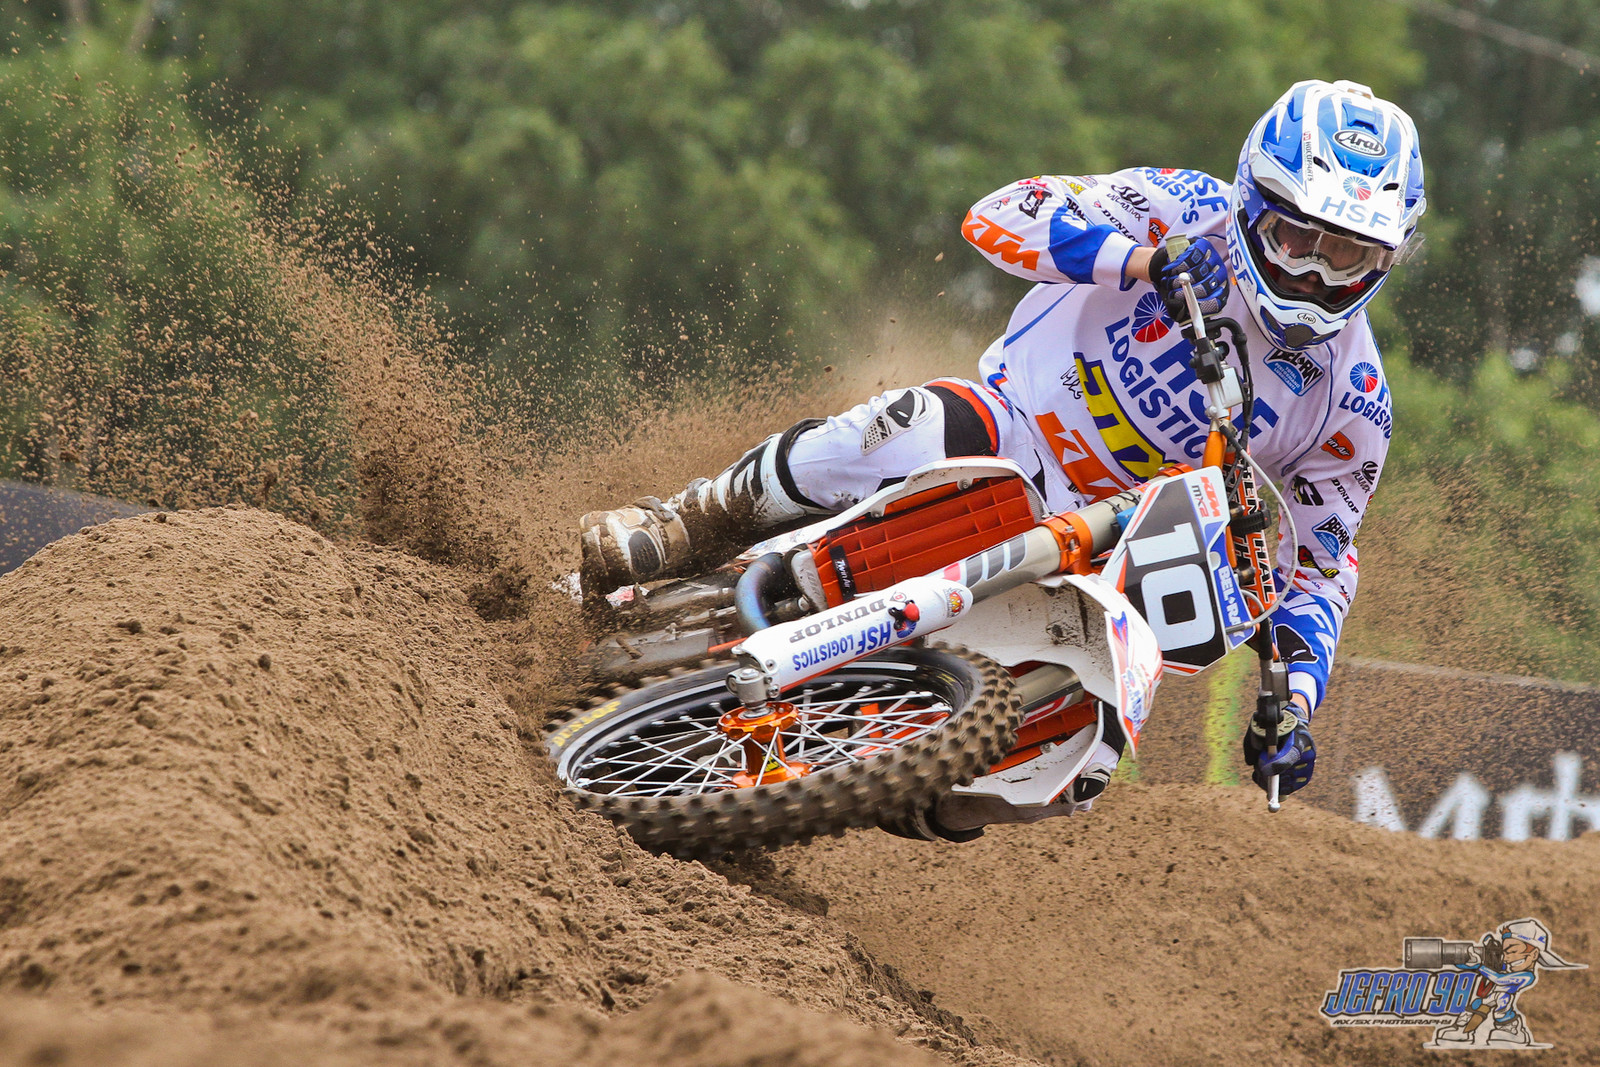 Calvin Vlaanderen - Photo Gallery: MXGP of Limburg - Motocross Pictures - Vital MX